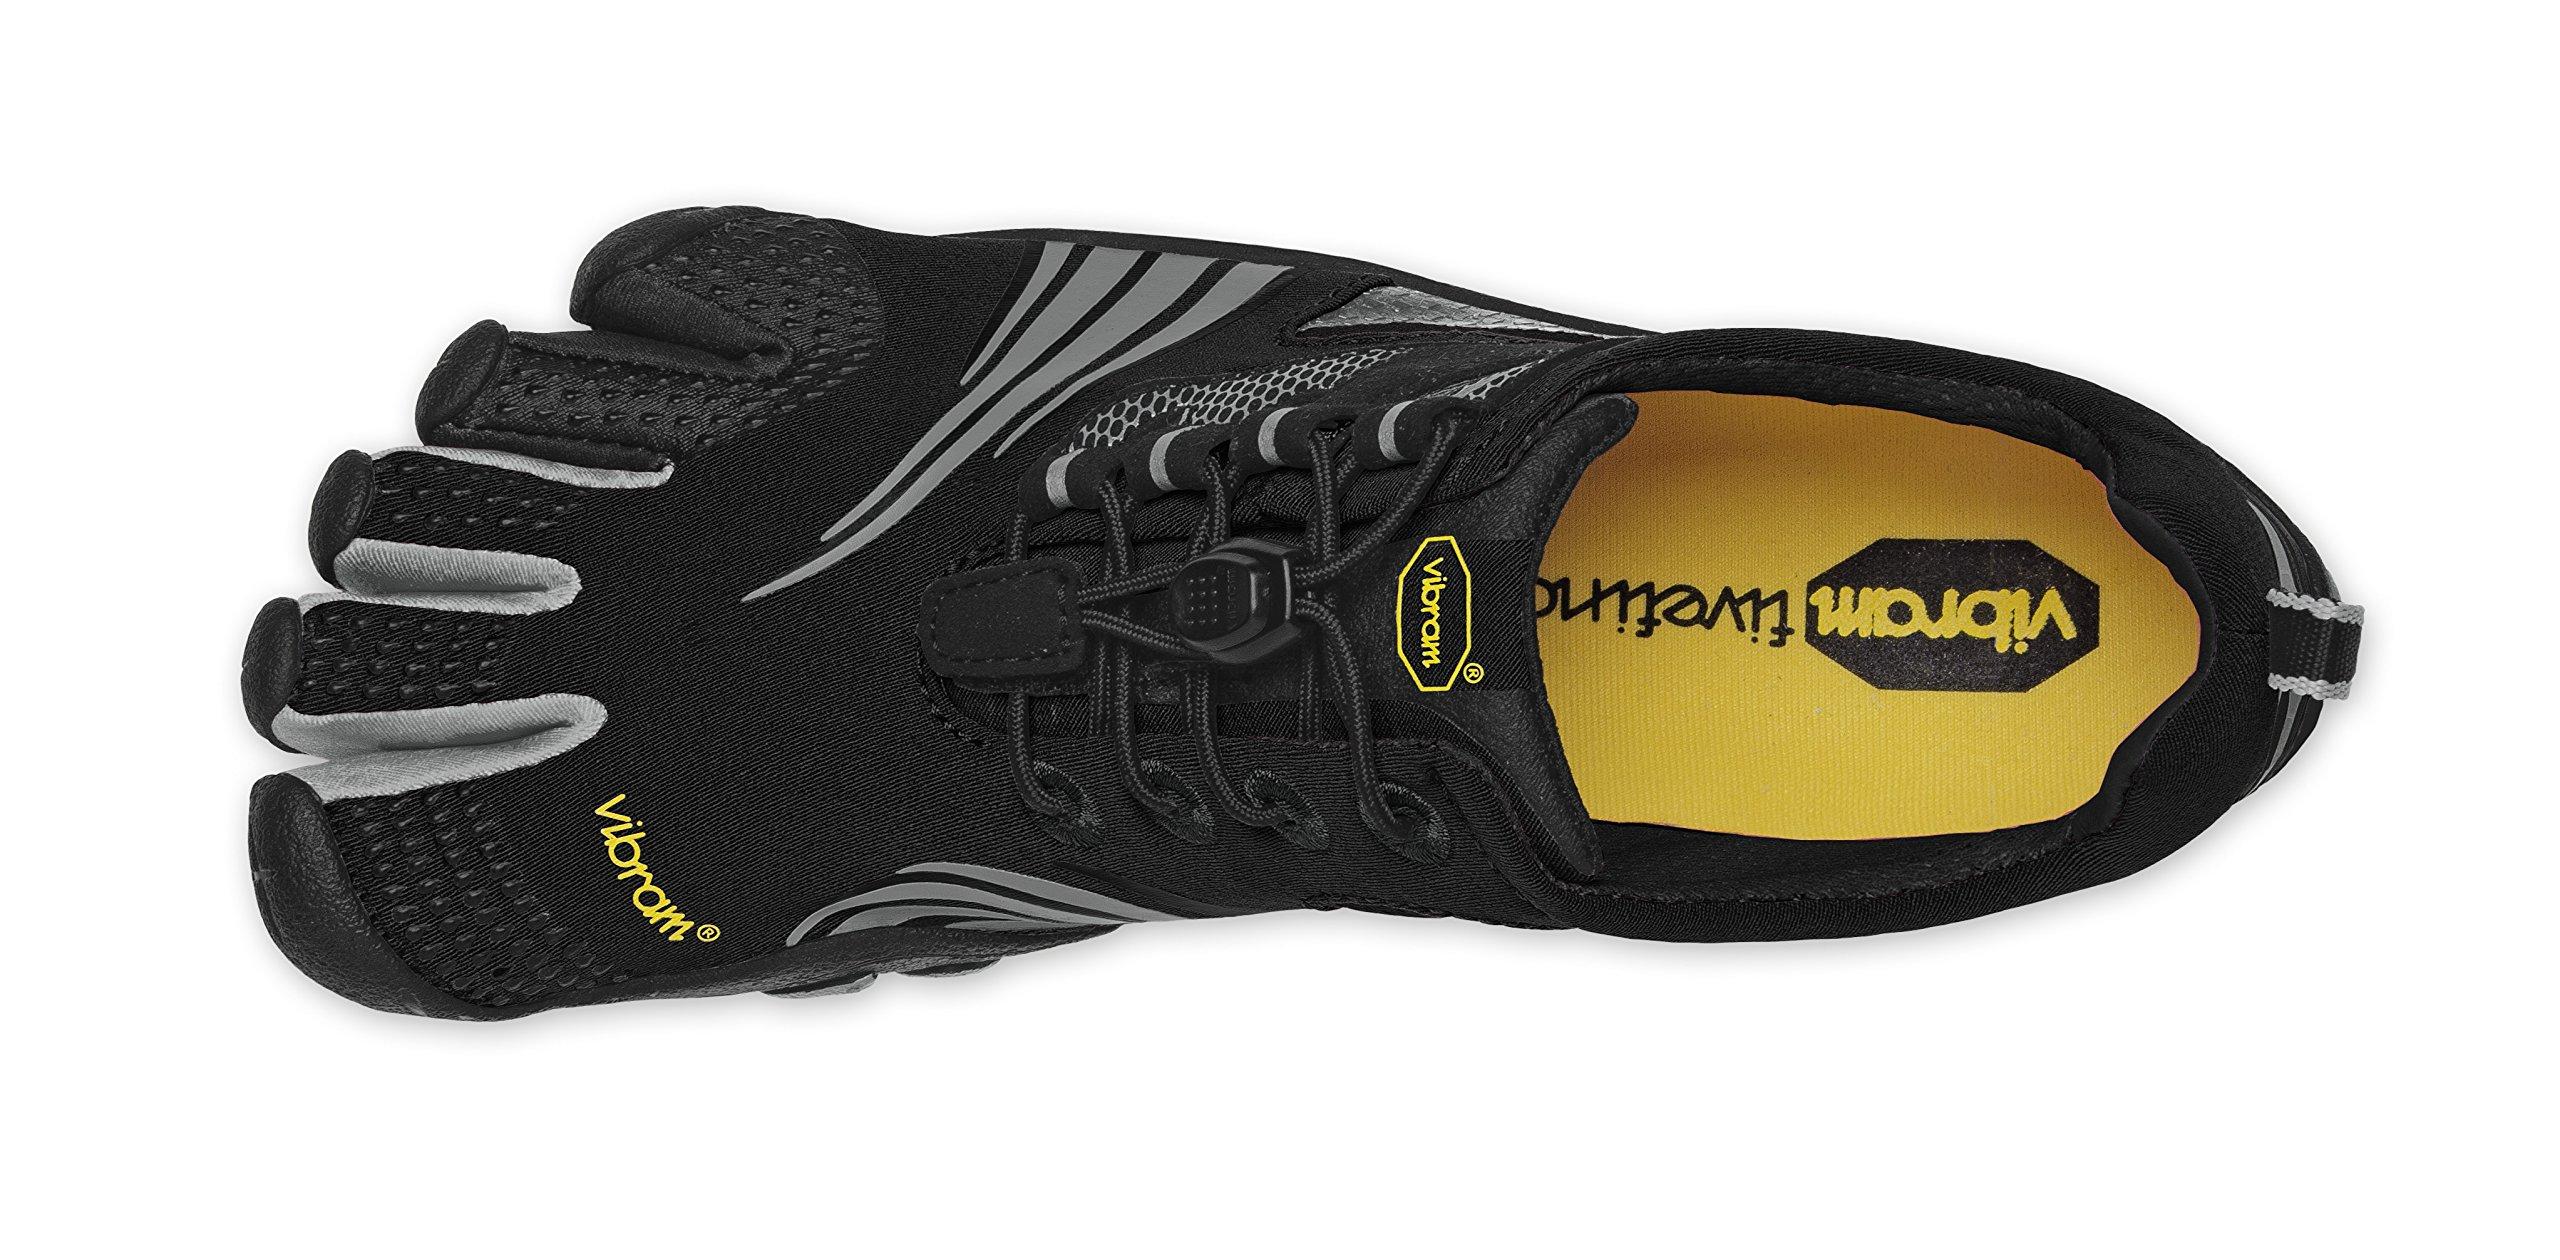 Vibram FiveFingers KMD Sport LS Black/Silver/Grey 14M3602 (Size: 41)